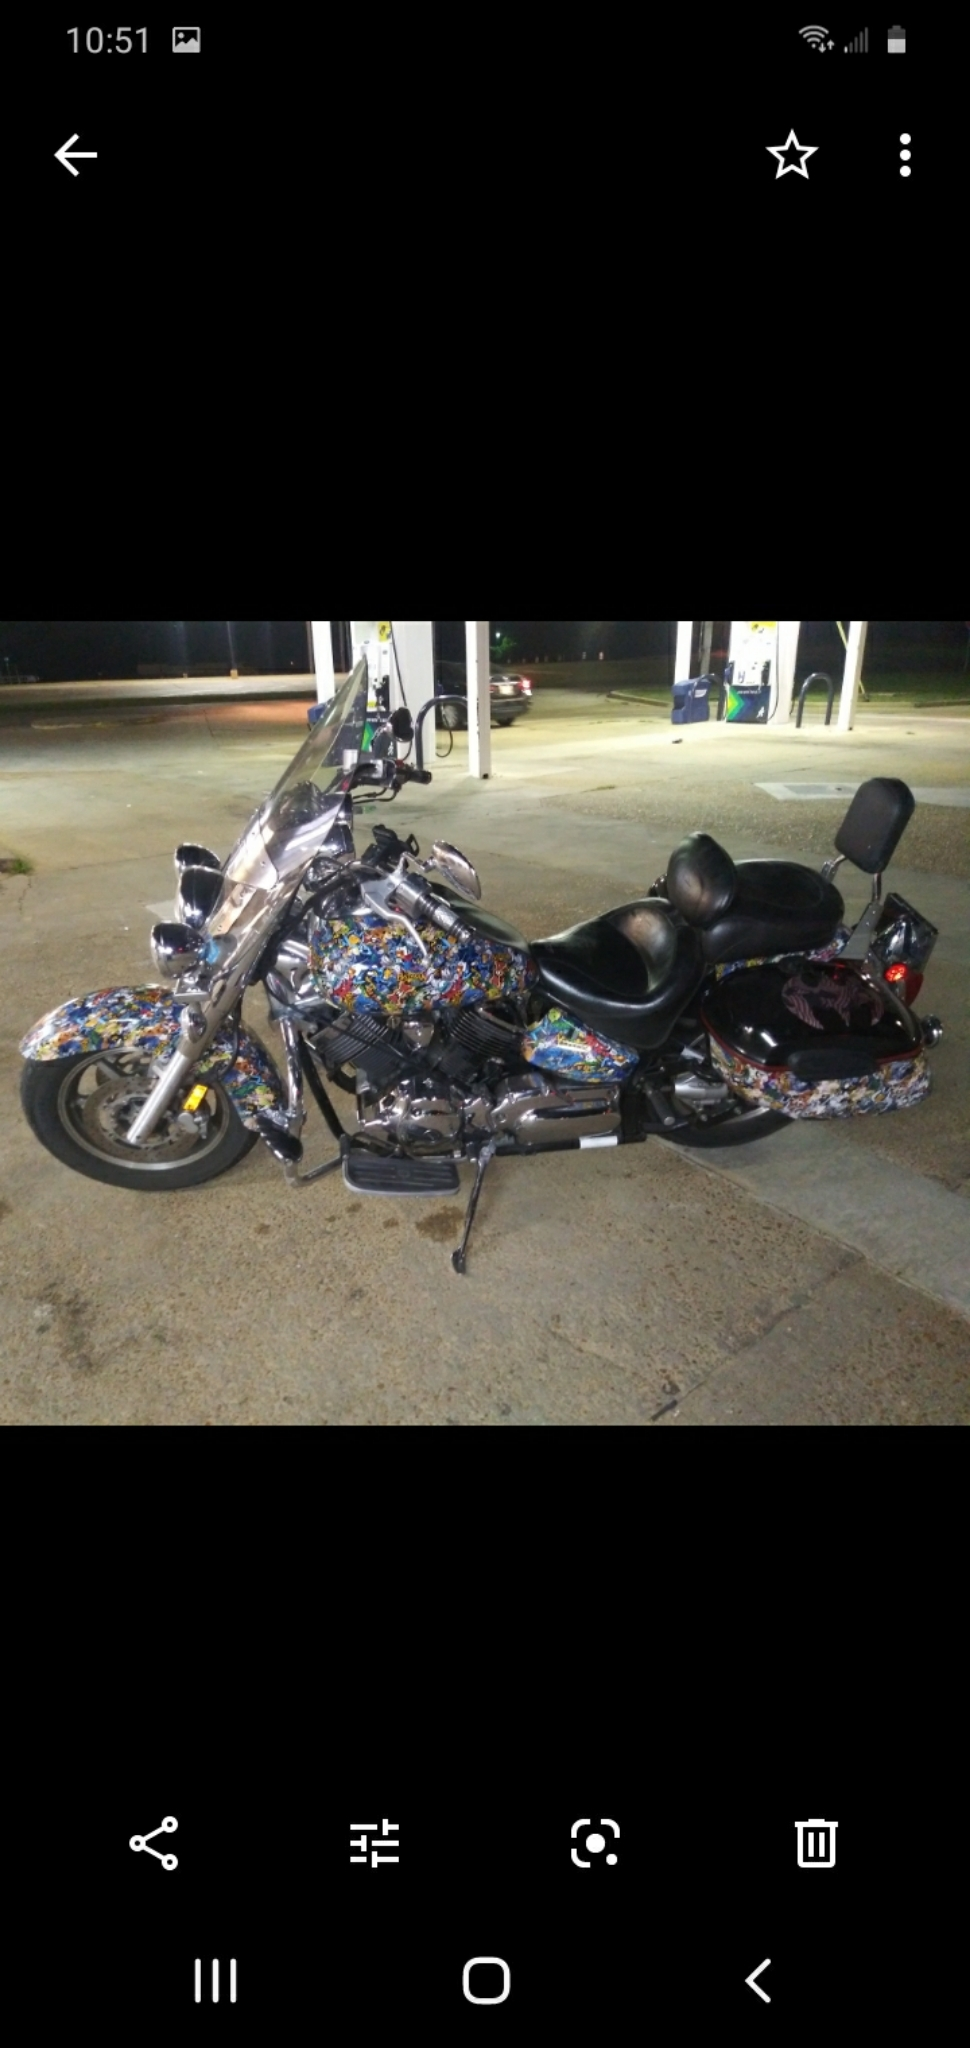 Photo 2005 Yamaha 1100 $350088.5588.55